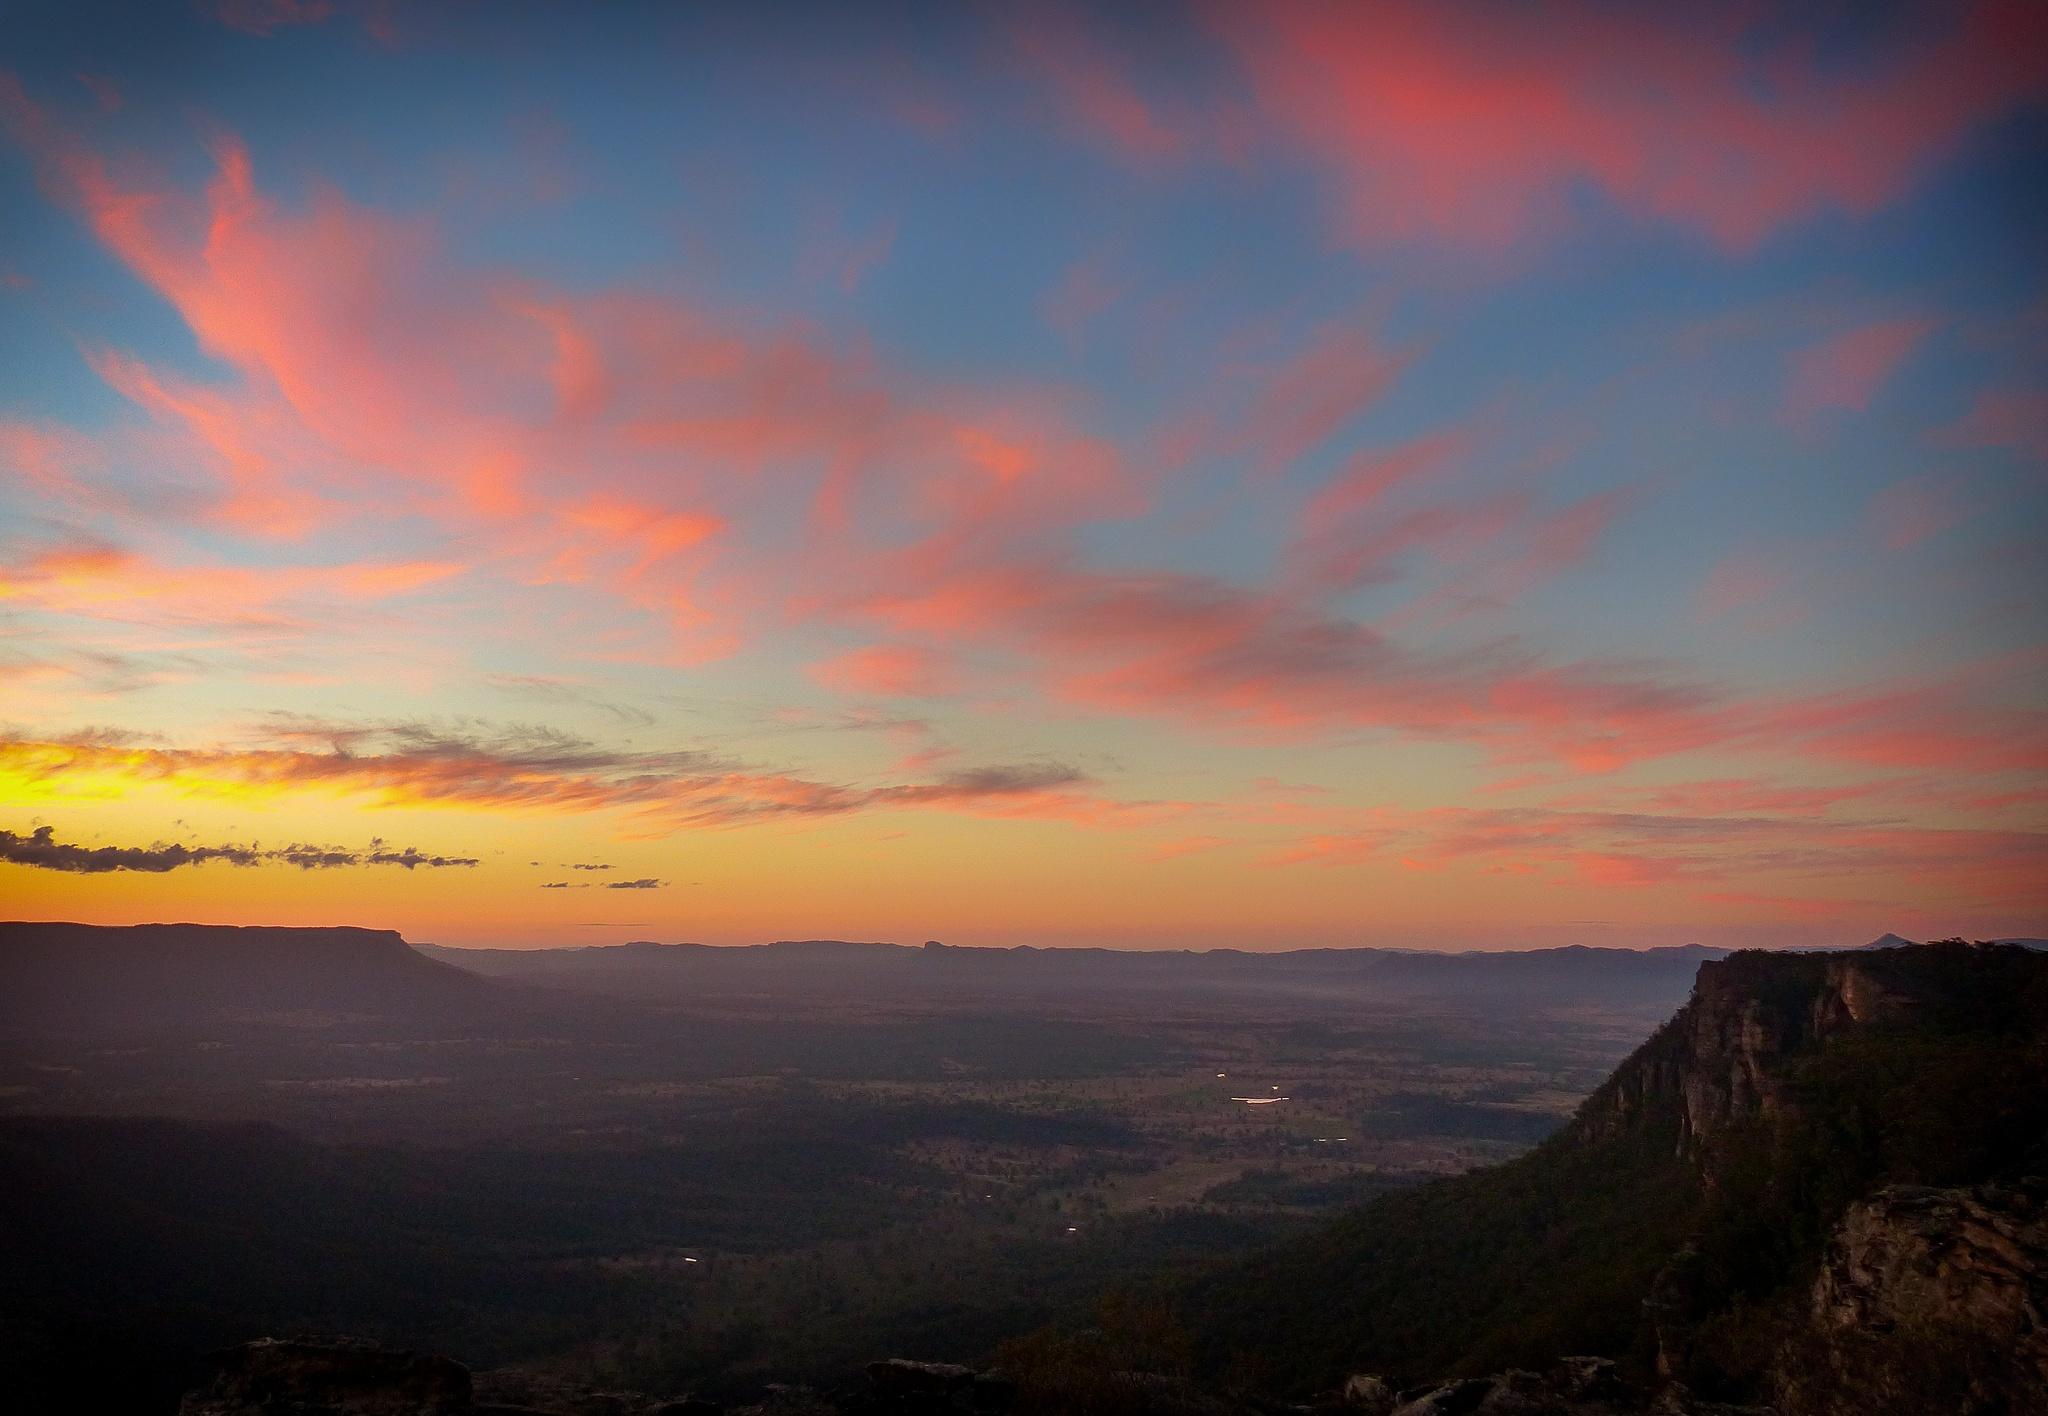 Capertee Sunset by Peter Medbury